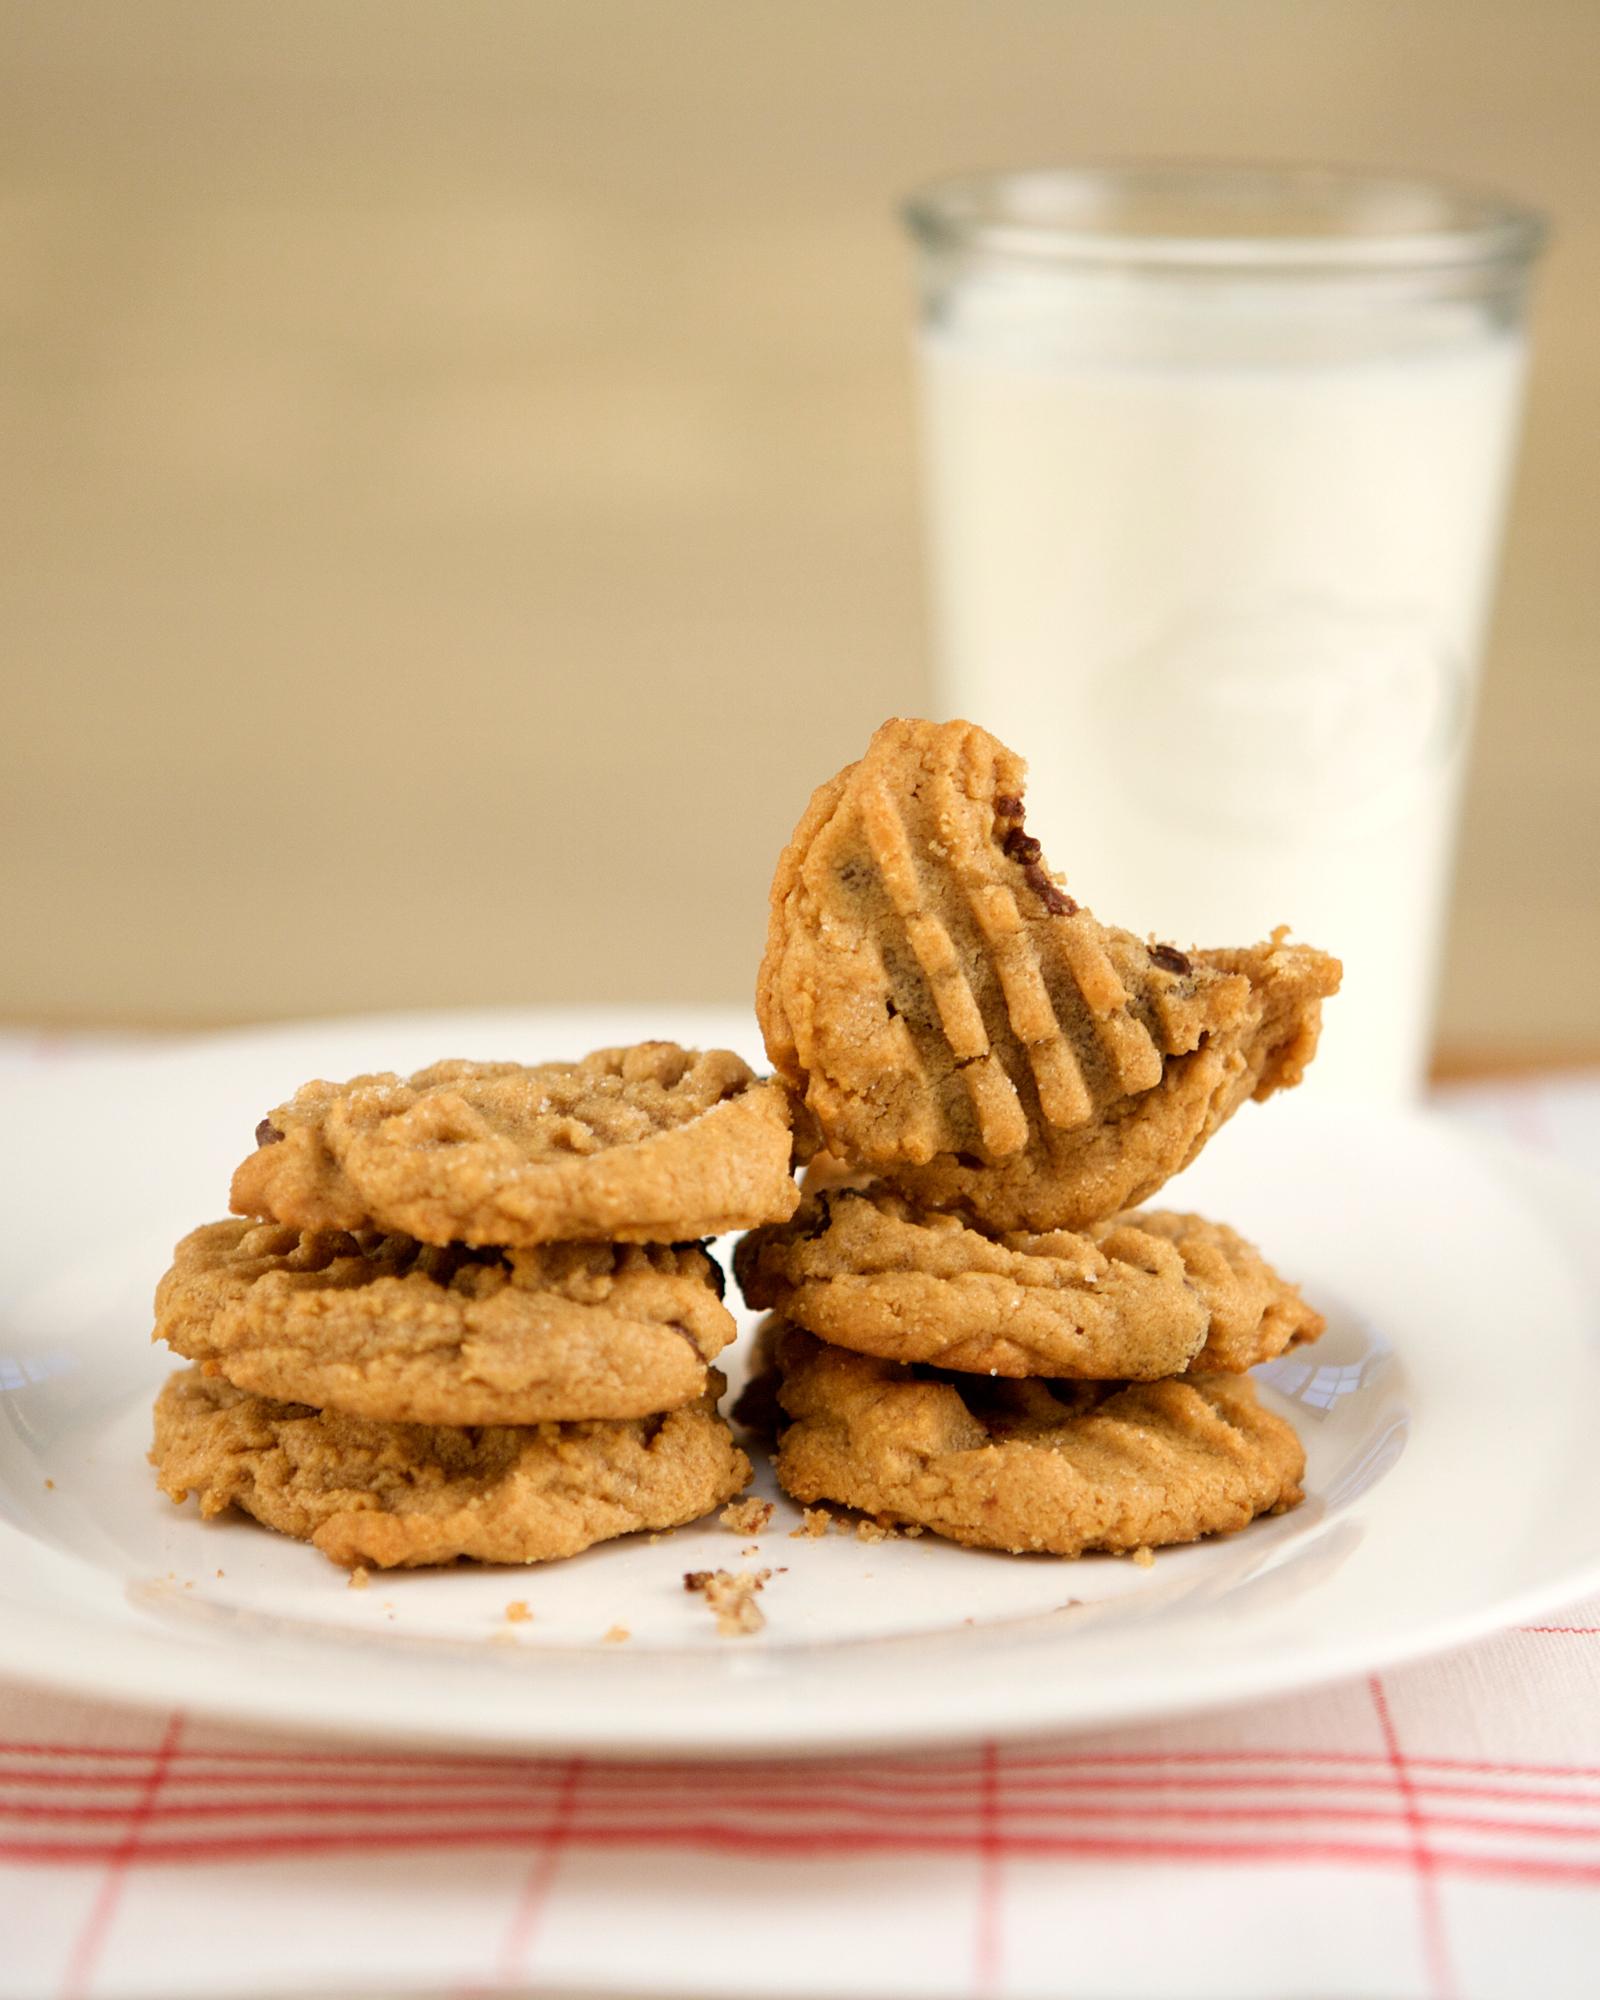 gluten-free-peanut-butter-cookies-ellb1036.jpg